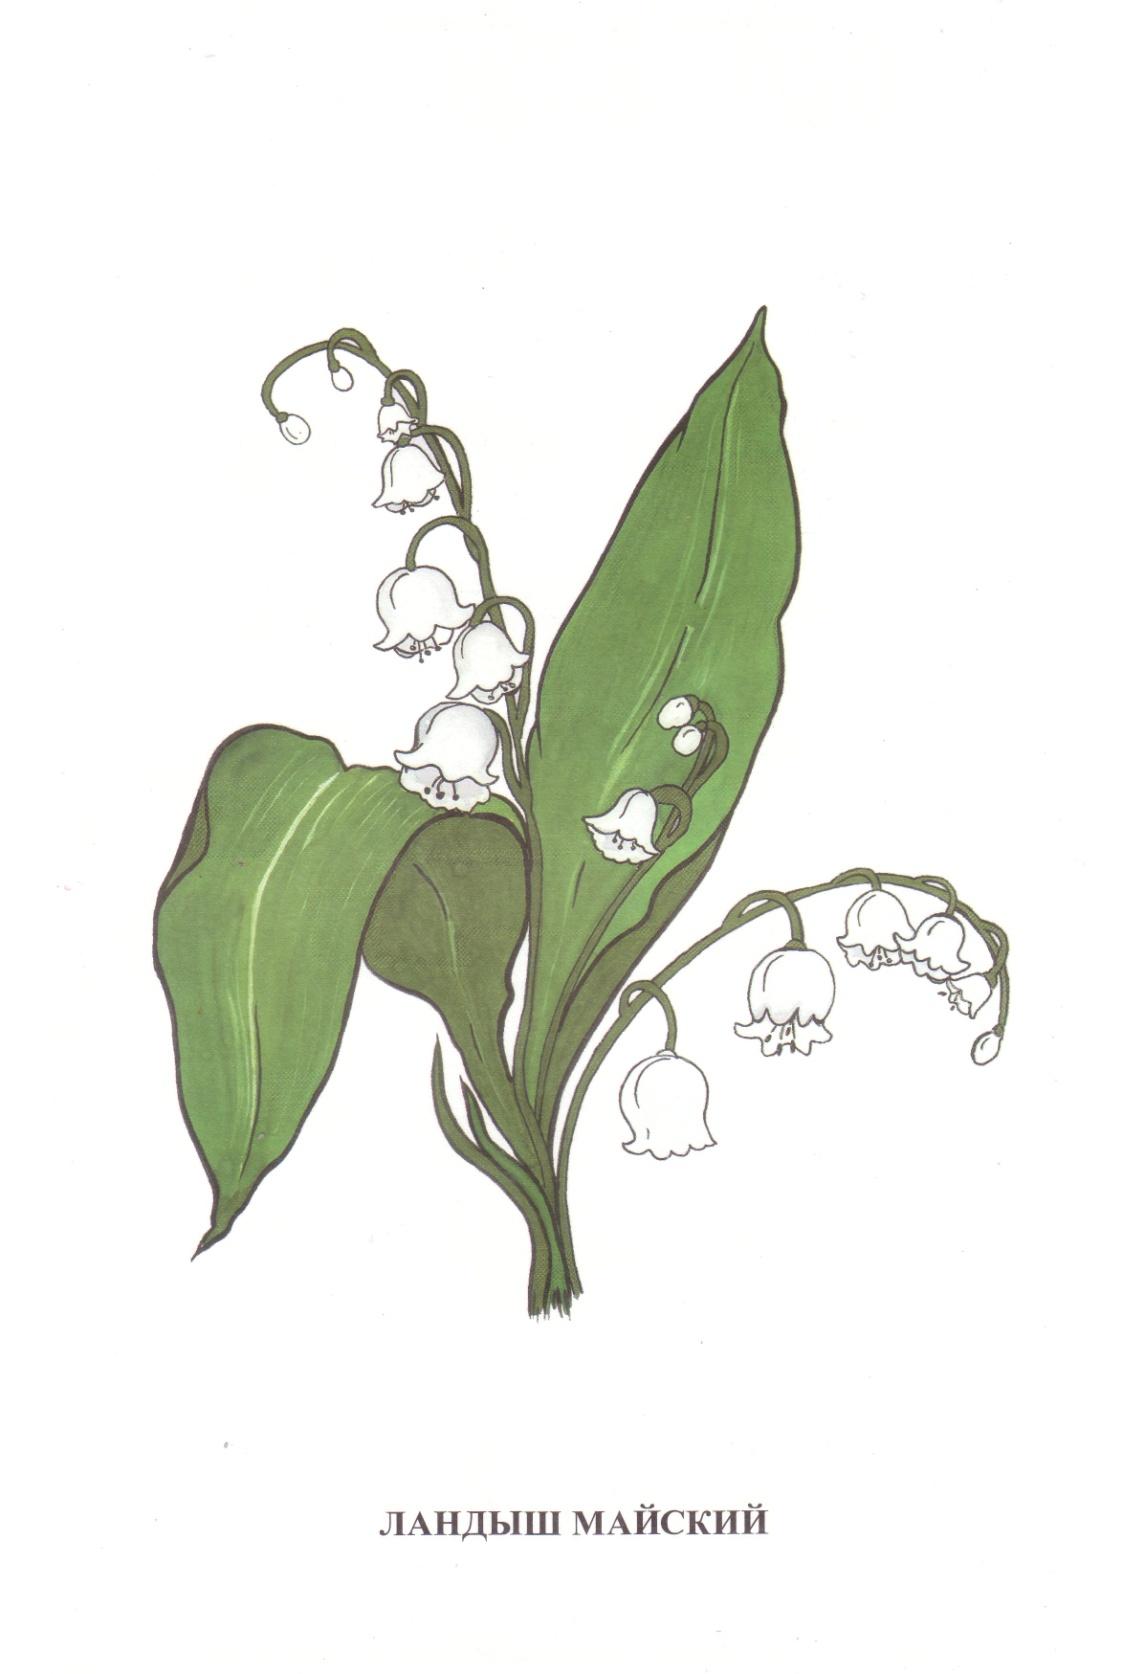 D:\школа 8 вида\Дидакт. материал картинки\Vohrinceva_полевые цветы\Vohrinceva_полевые цветы\1-9.jpg